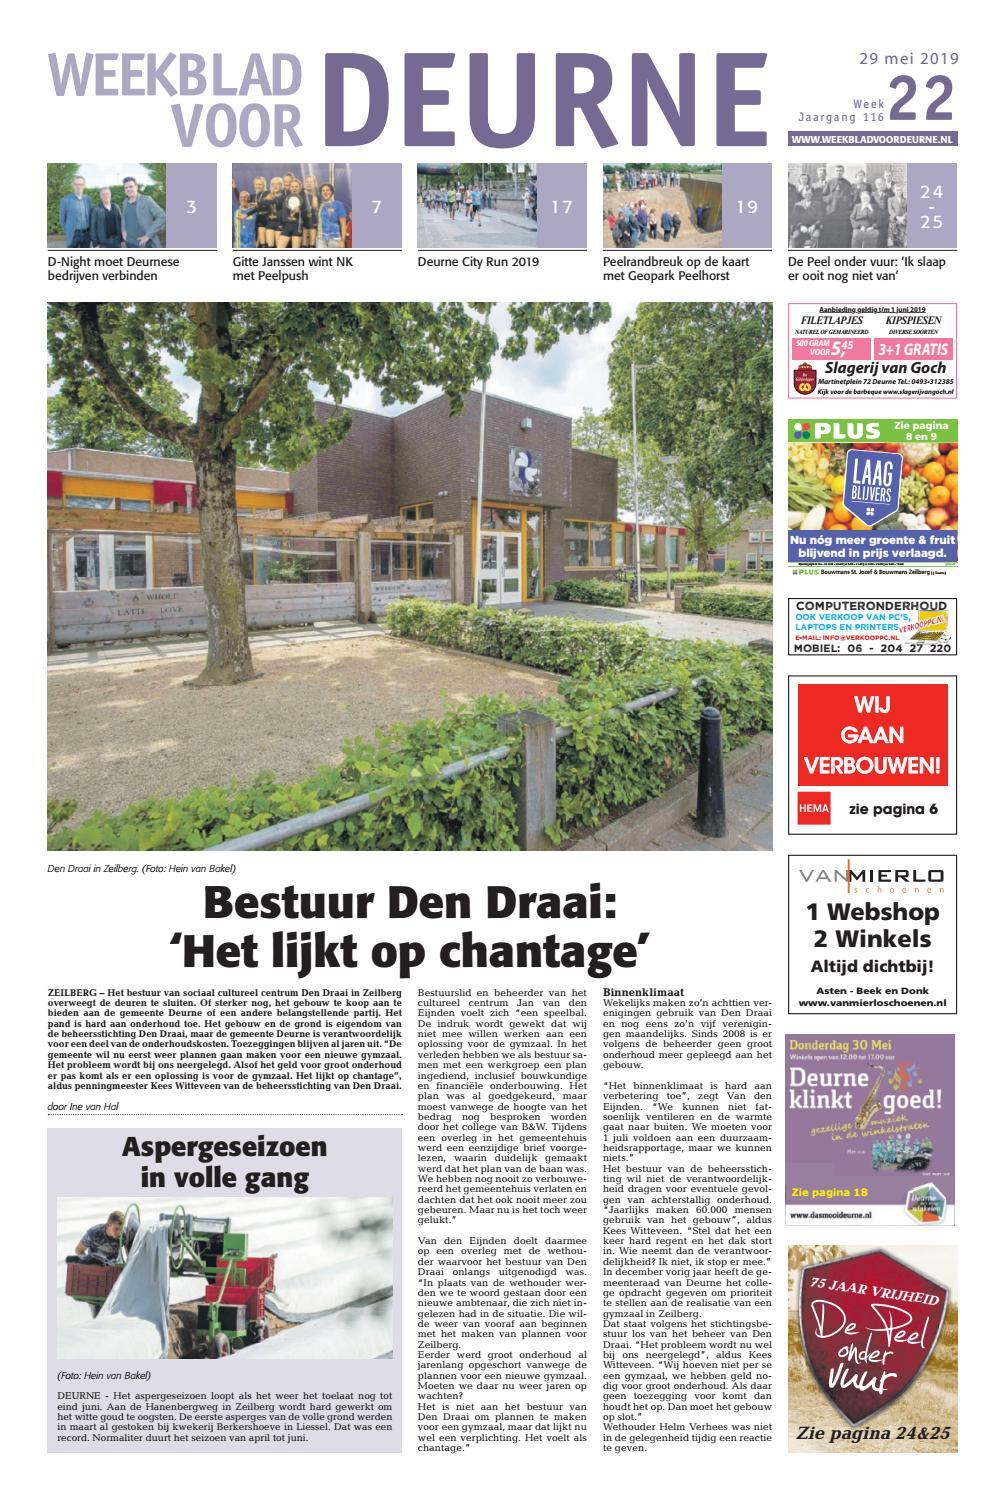 11ec80a027e Weekblad voor Deurne 30-05-2019 by Das Publishers! - issuu